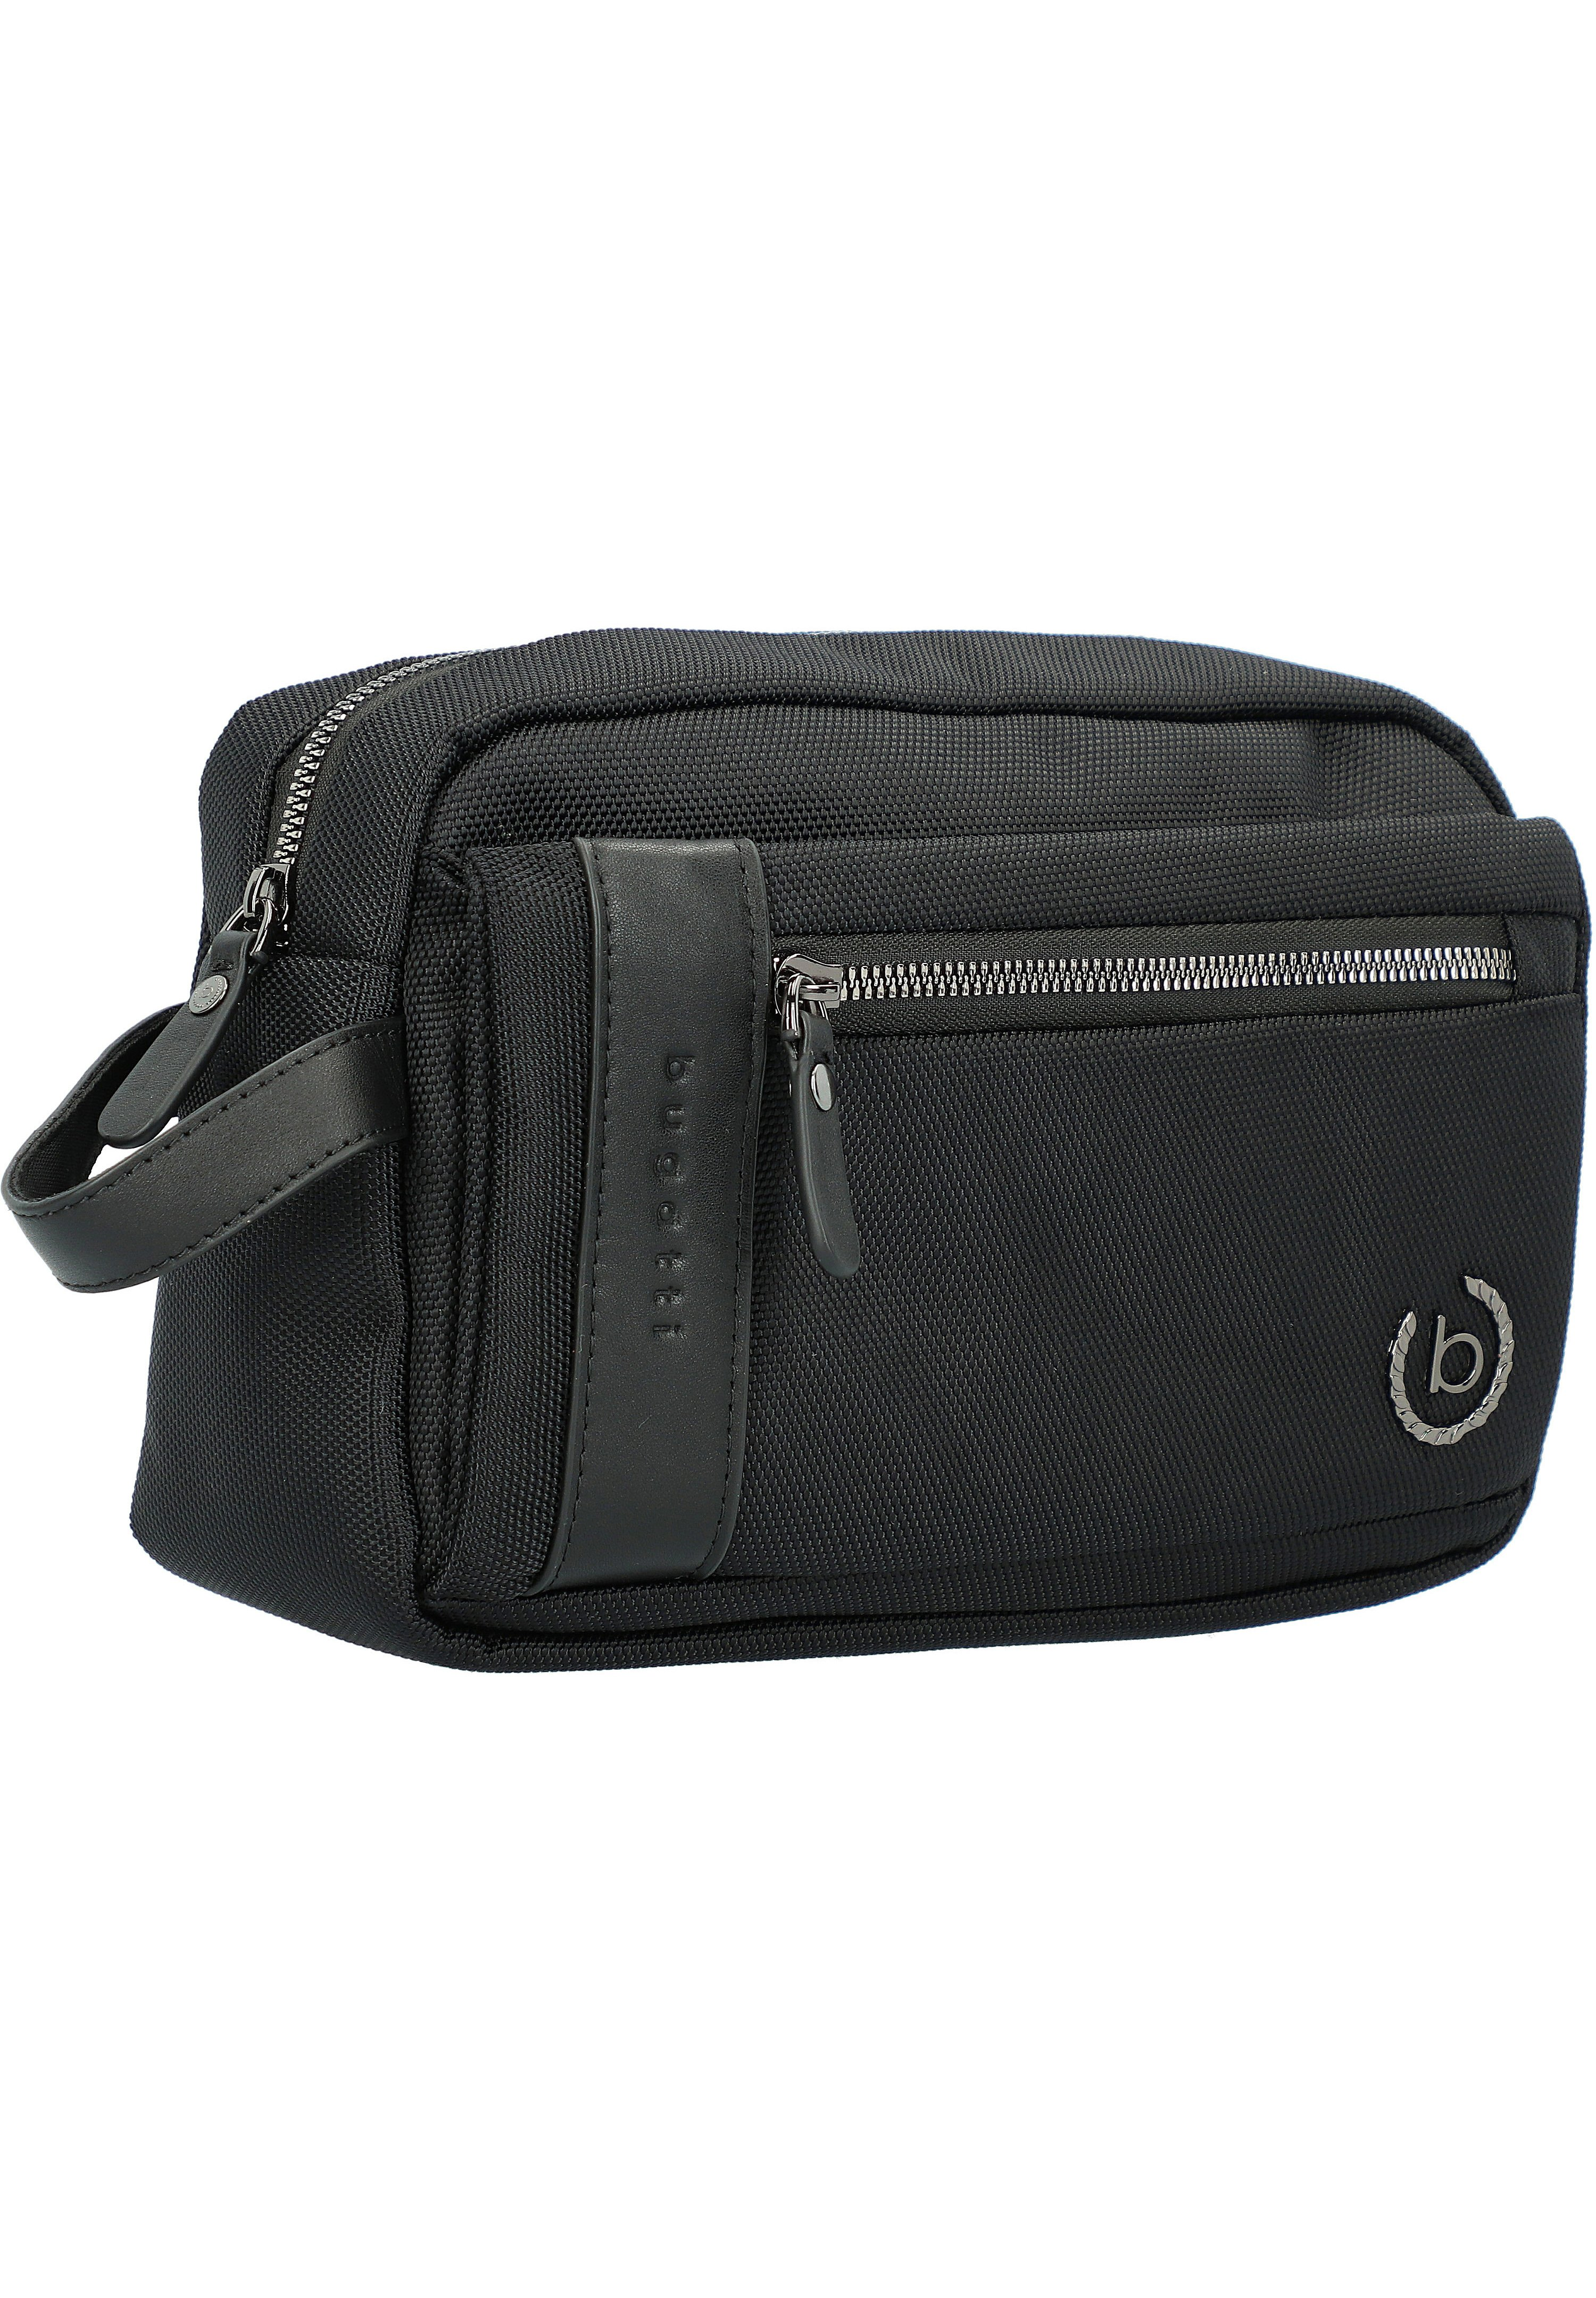 Bugatti Kosmetiktasche - schwarz - Herrentaschen Lb4E0